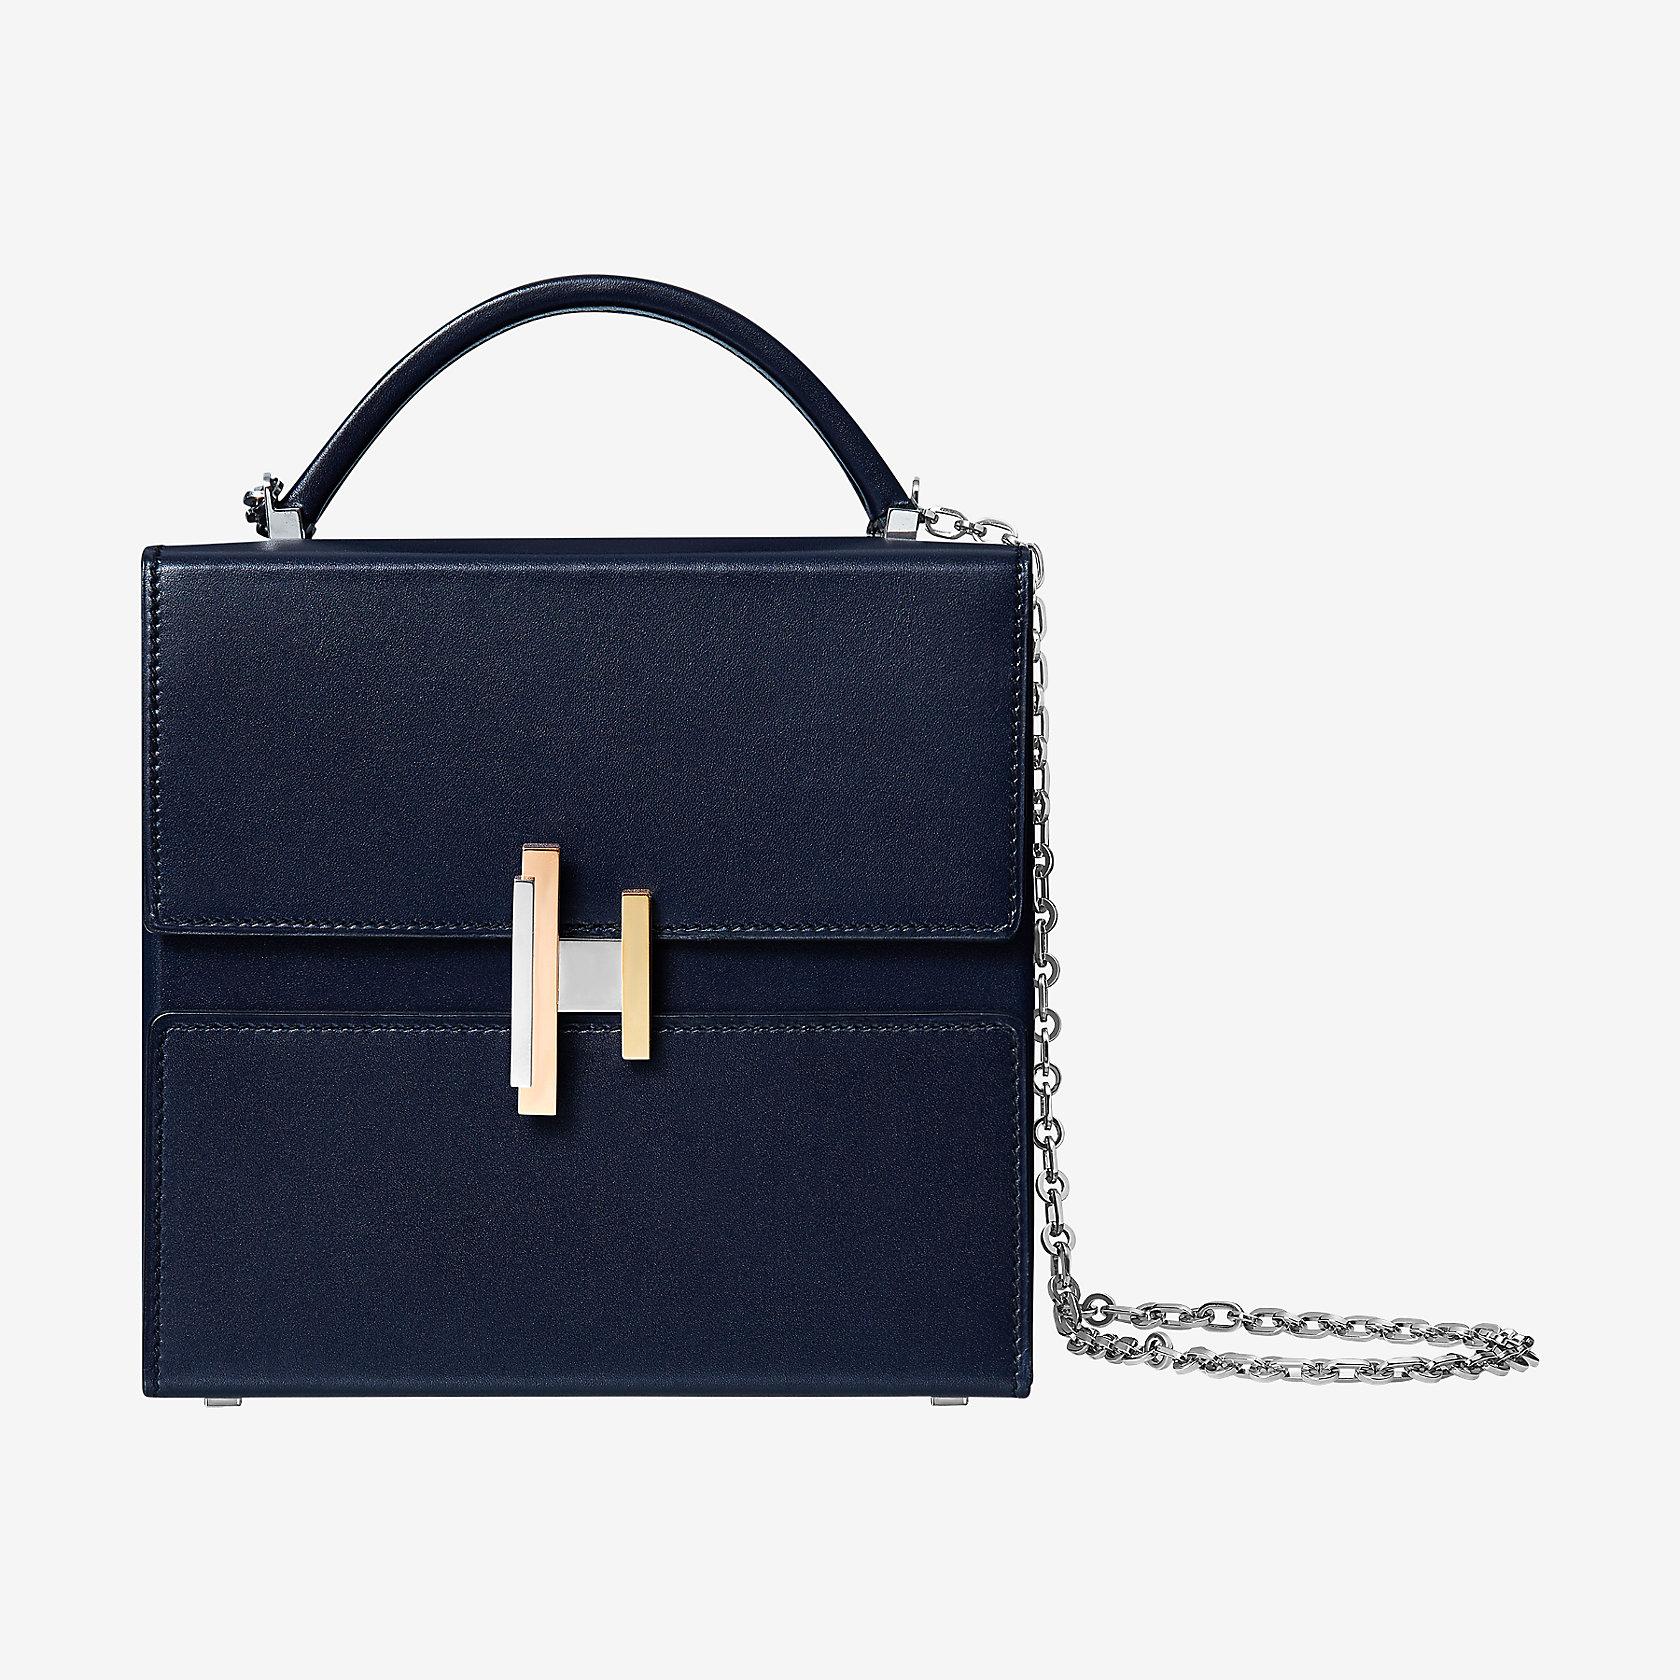 cb007a6923 Hermes Cinhetic verso bag   Hermès